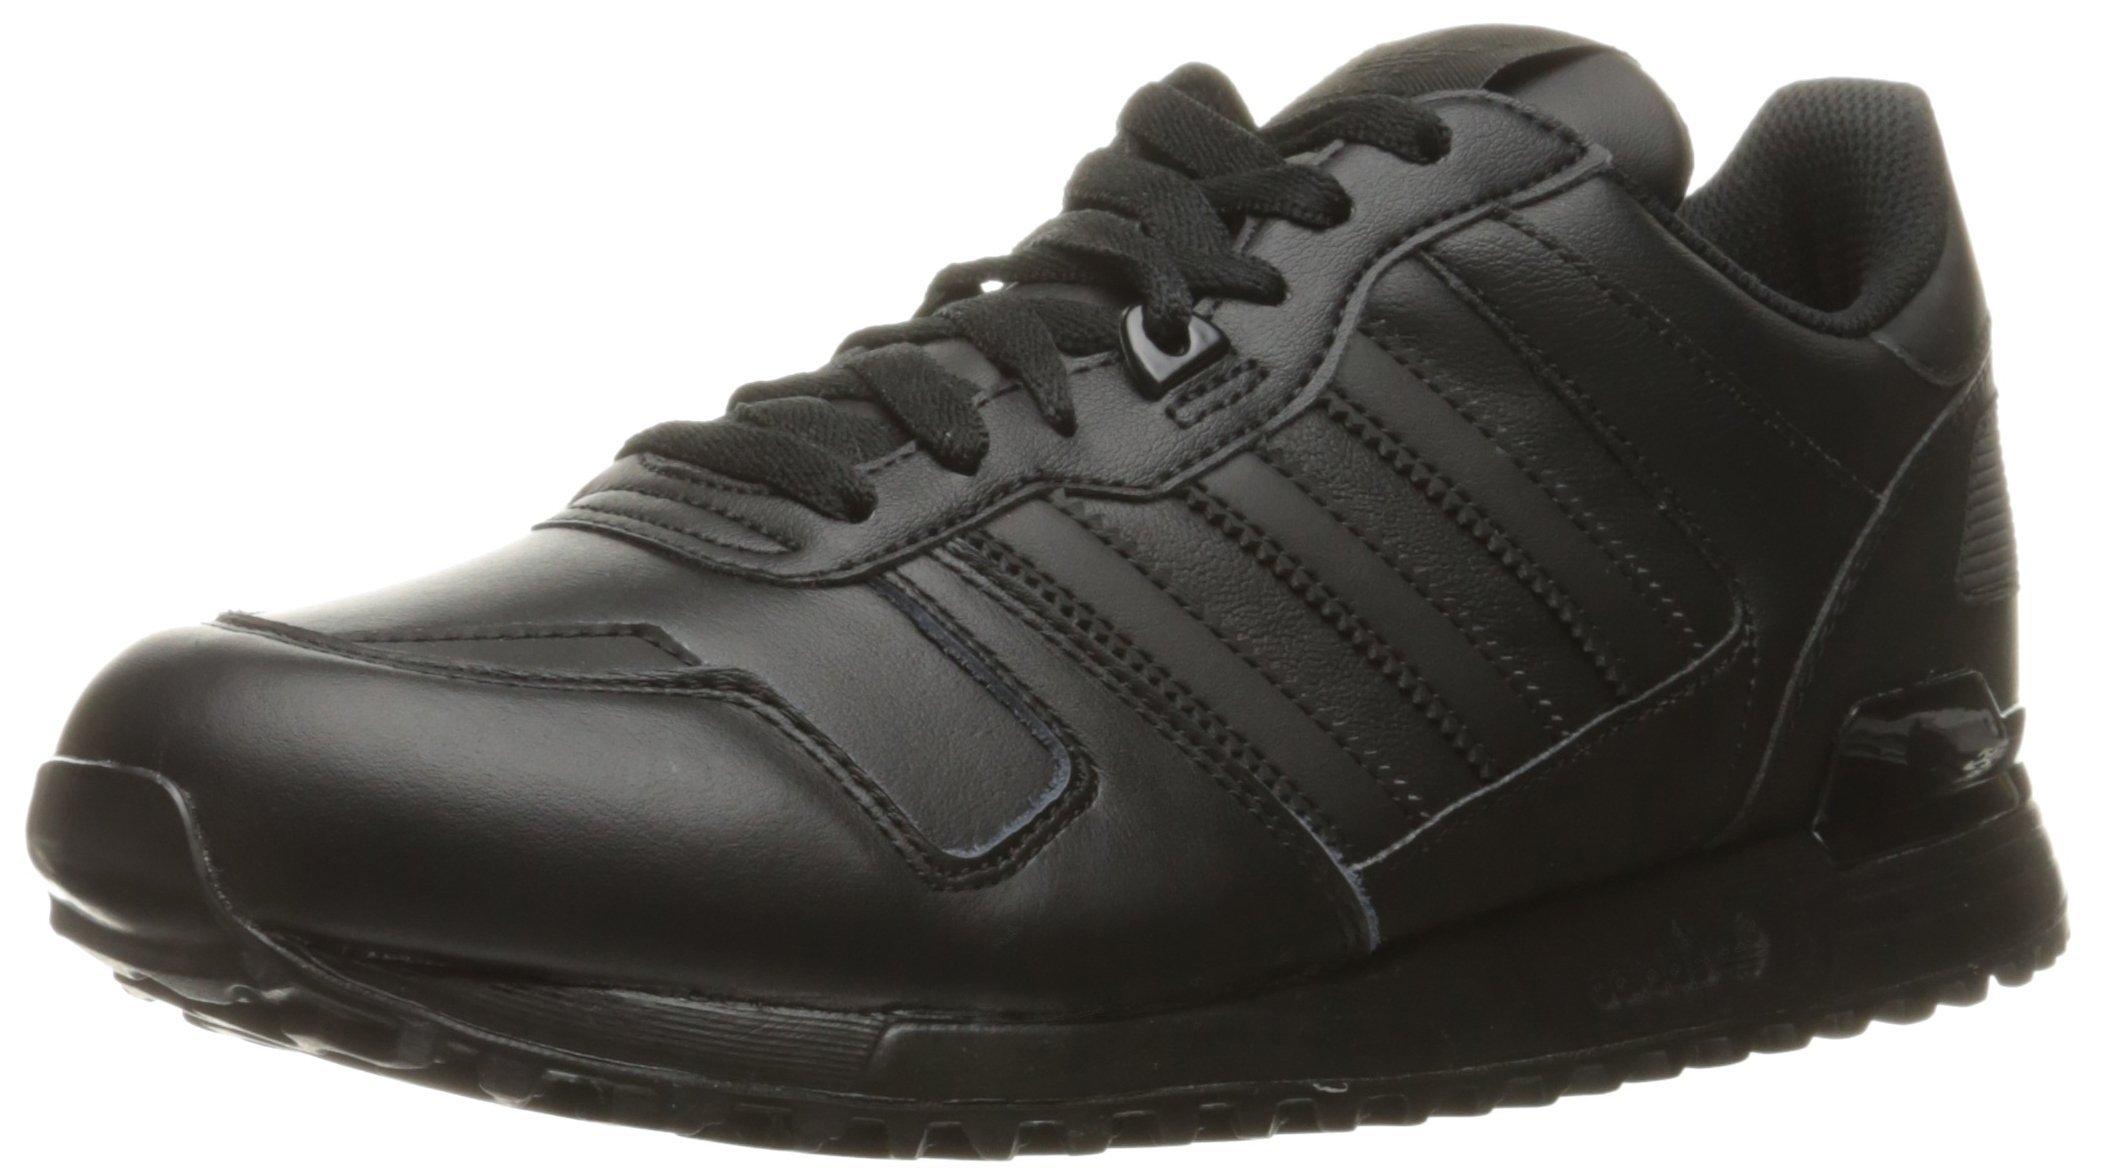 09b8a908d Galleon - Adidas Originals Men s Zx 700 Fashion Sneaker